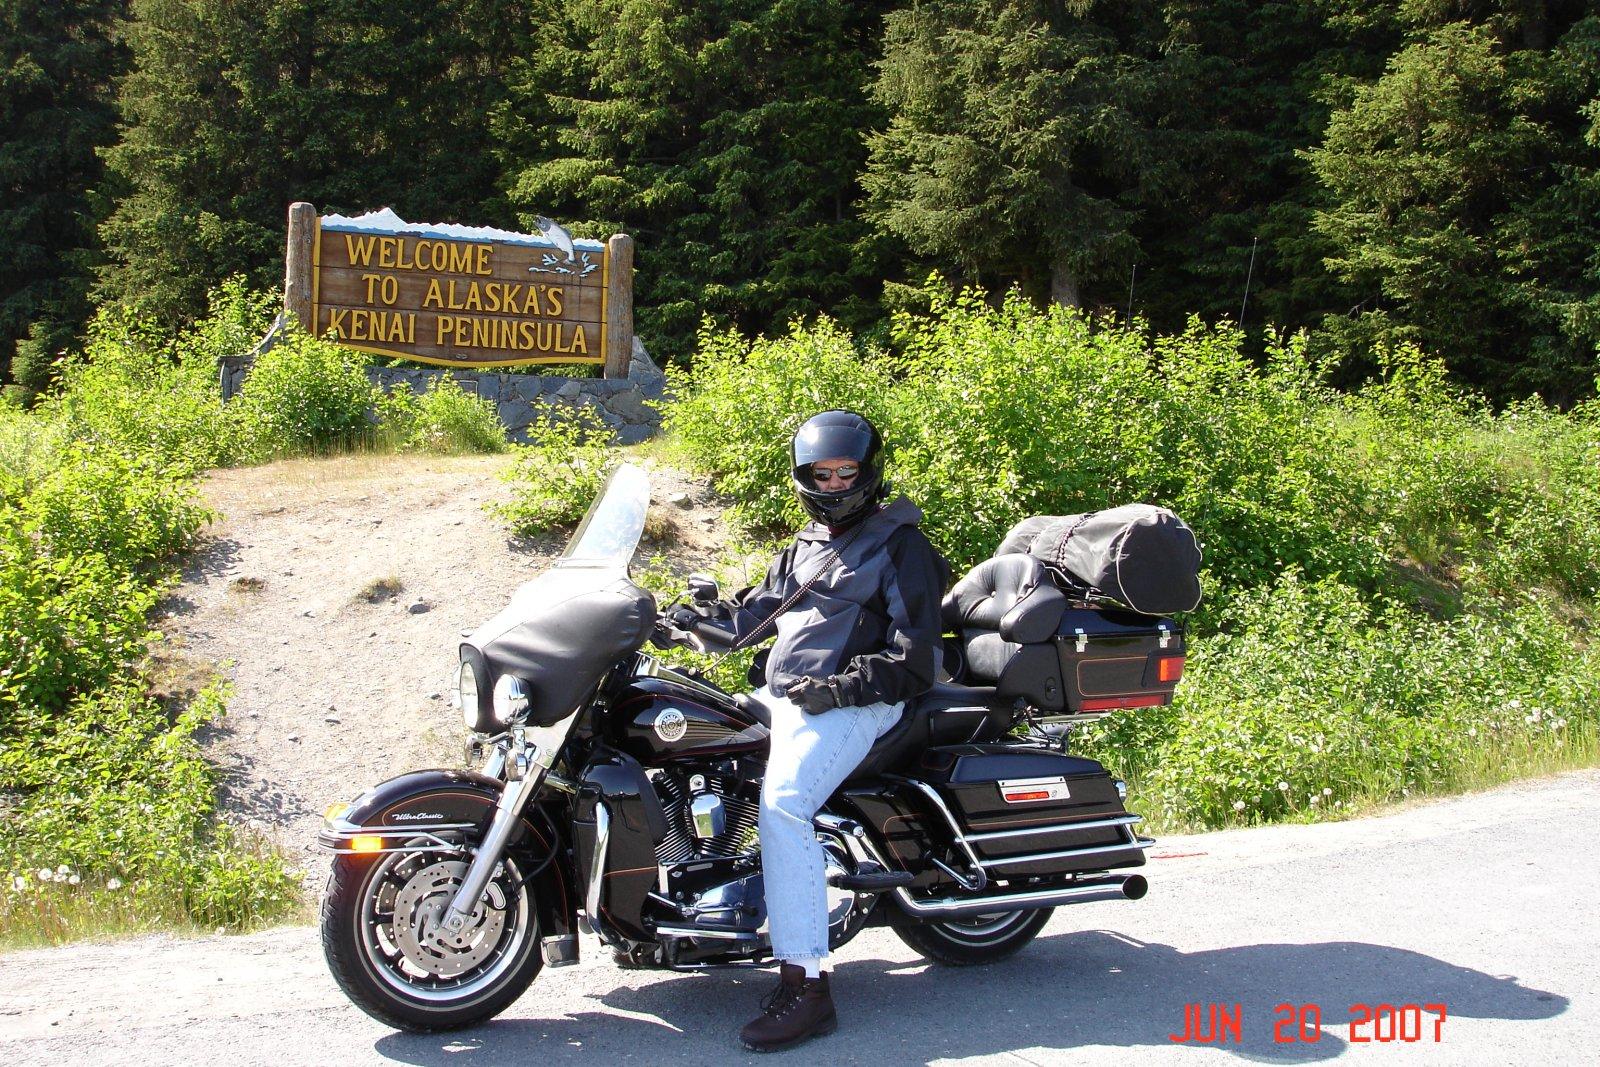 Click image for larger version  Name:Alaska 2007 054.jpg Views:61 Size:619.6 KB ID:113484